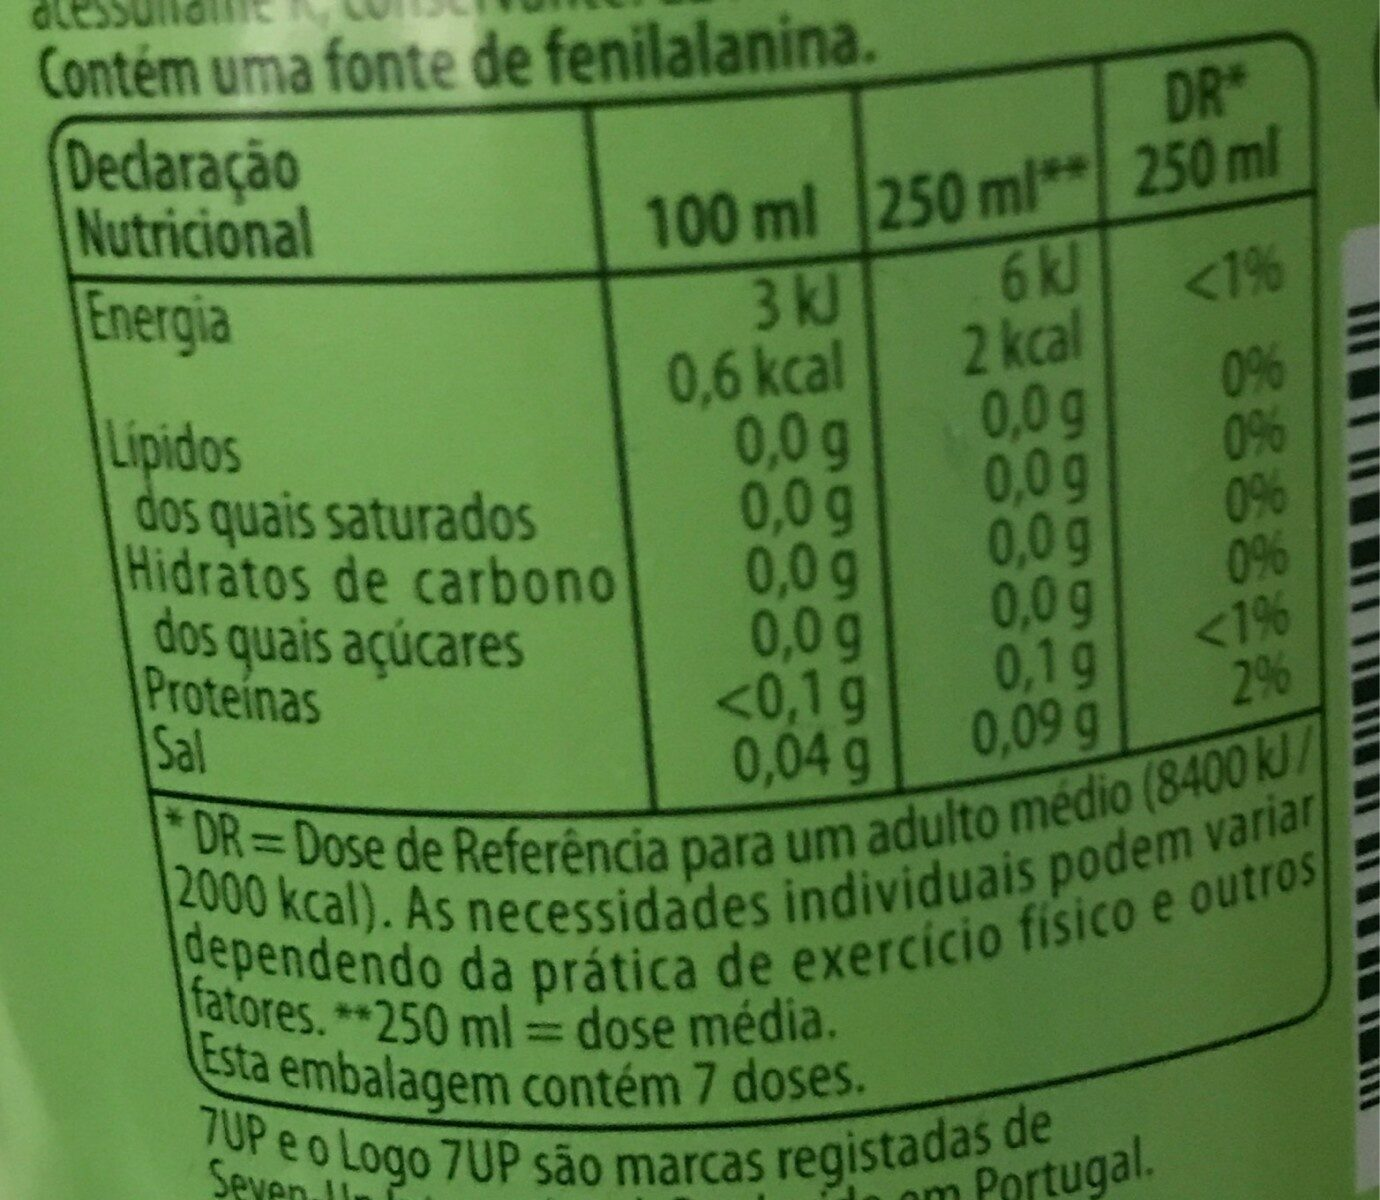 7up free - Valori nutrizionali - pt